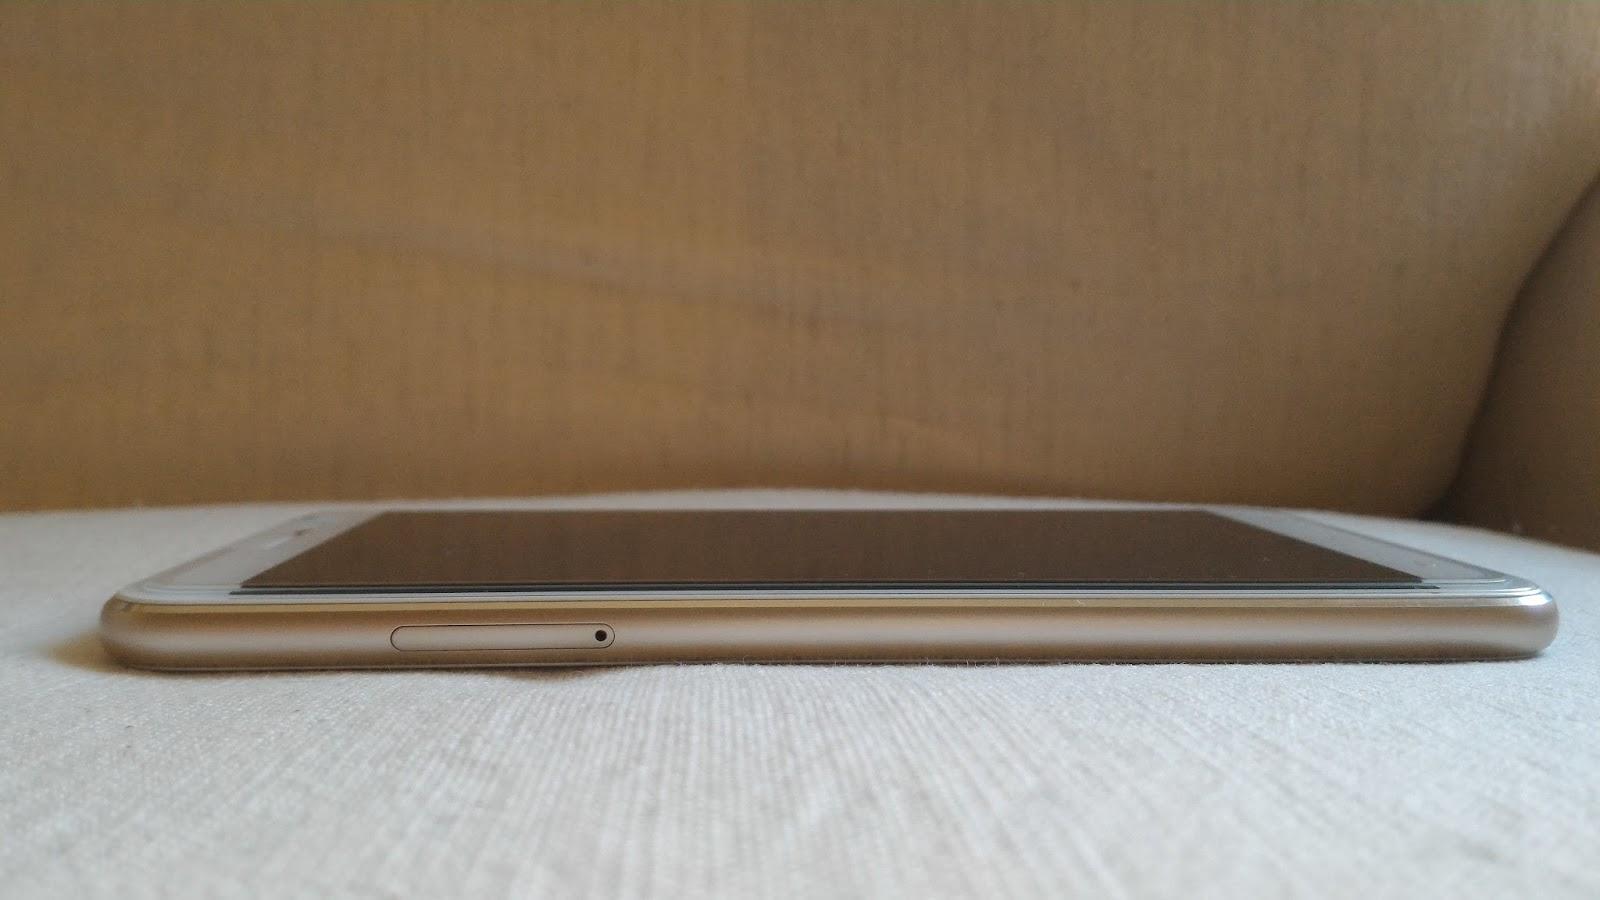 P 20170126 162303 - [開箱] 平價奢華 Zenfone 3 ZE552KL 月光白 4G/64G,外型大進化、CP值破表!